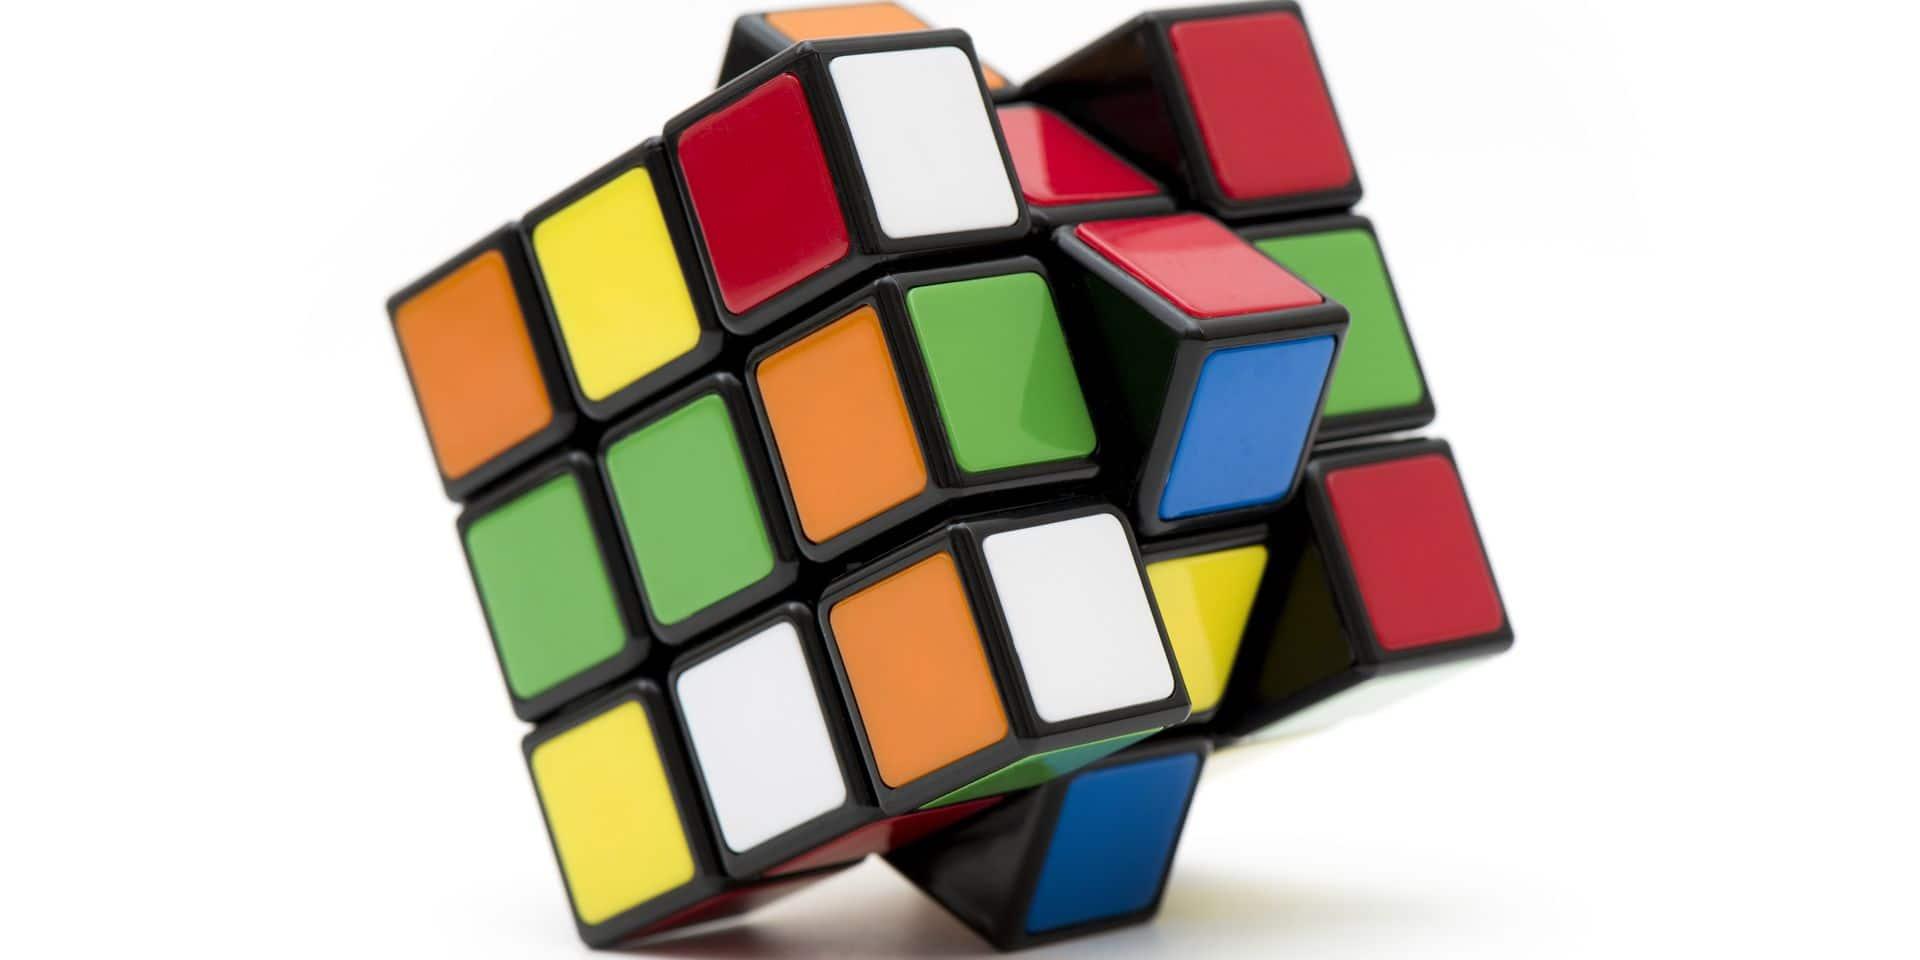 Istanbul,,Turkey.,October,2,,2017.,Huge,3x3,Rubik's,Cube,On